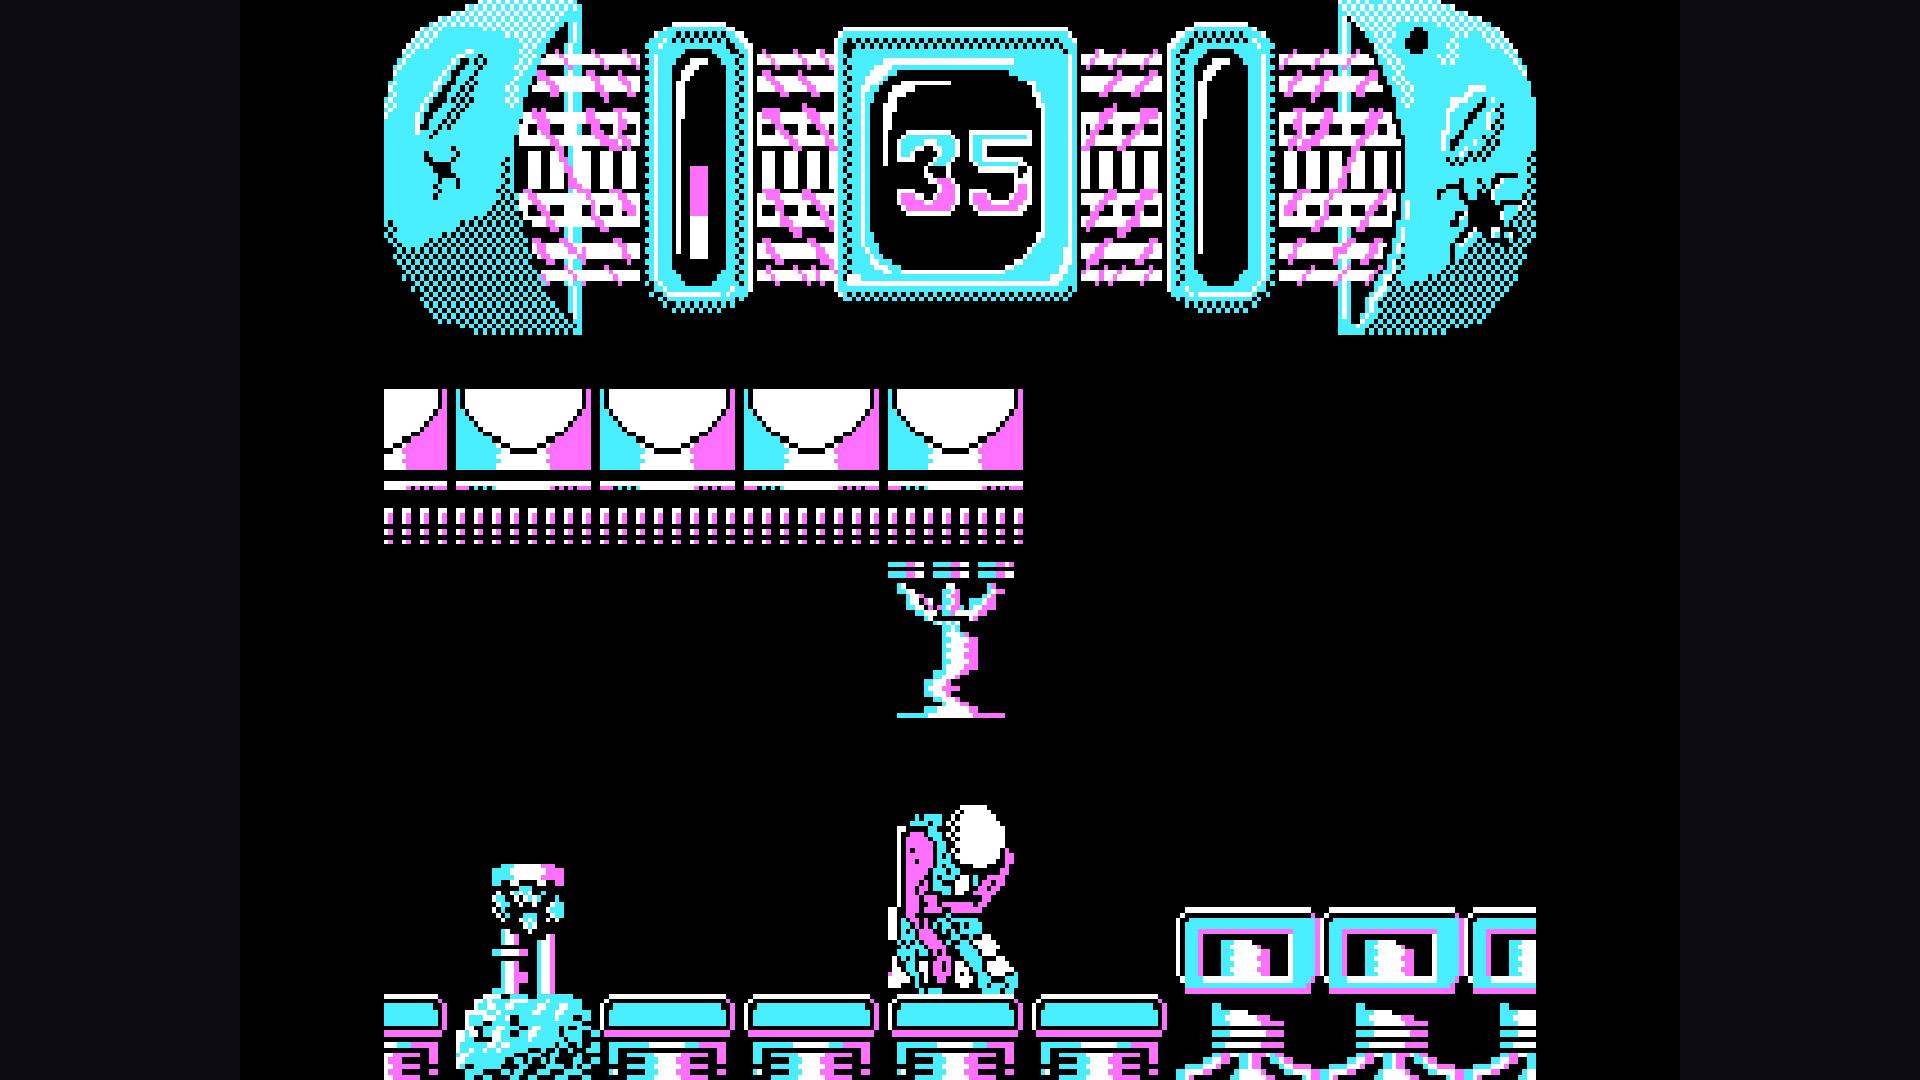 Trantor: The Last Stormtrooper screenshot